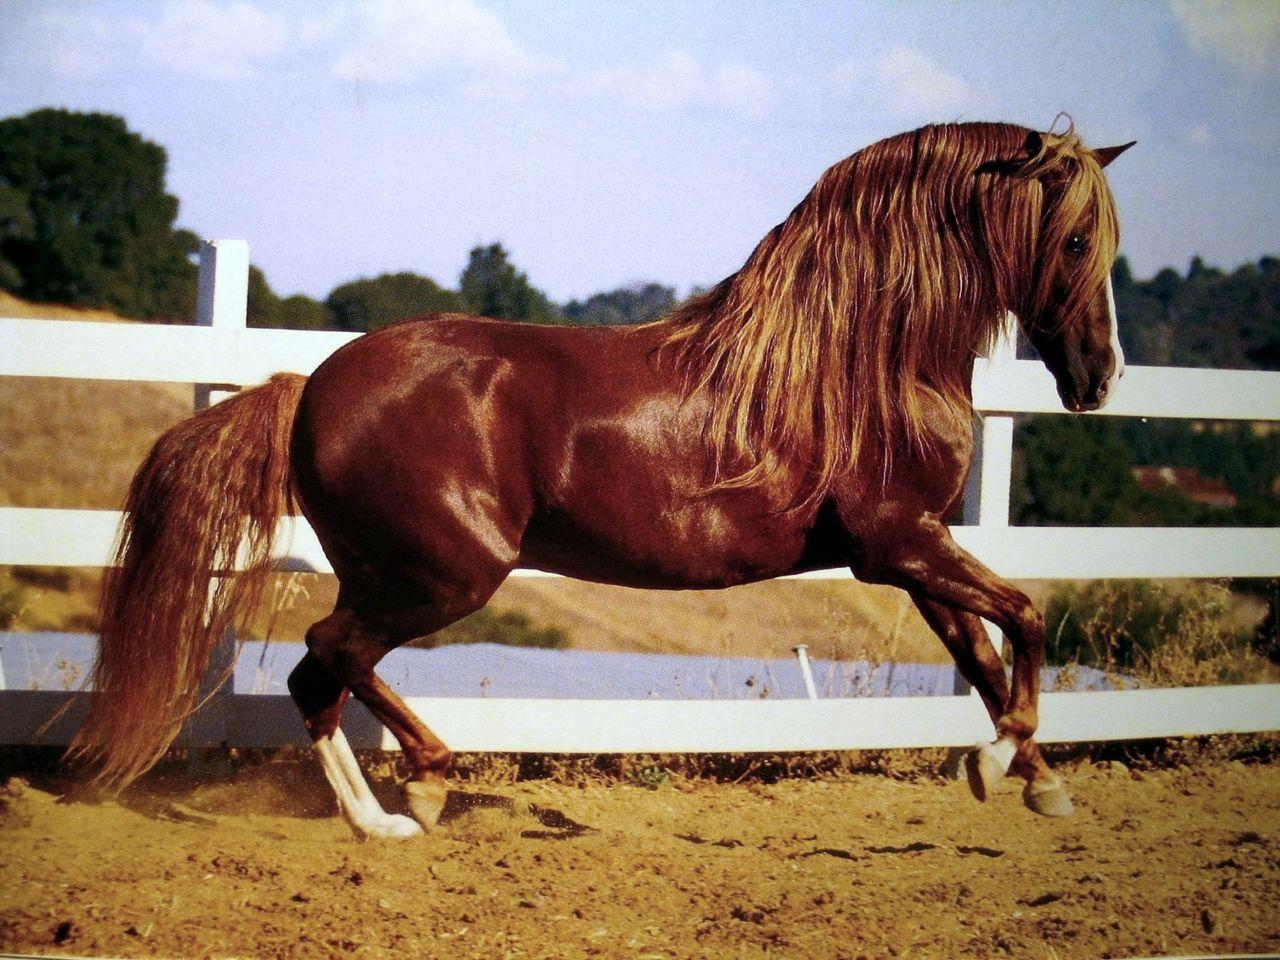 Glowing Beauty | Horses | Horses, Chestnut horse, Horse breeds - photo#9